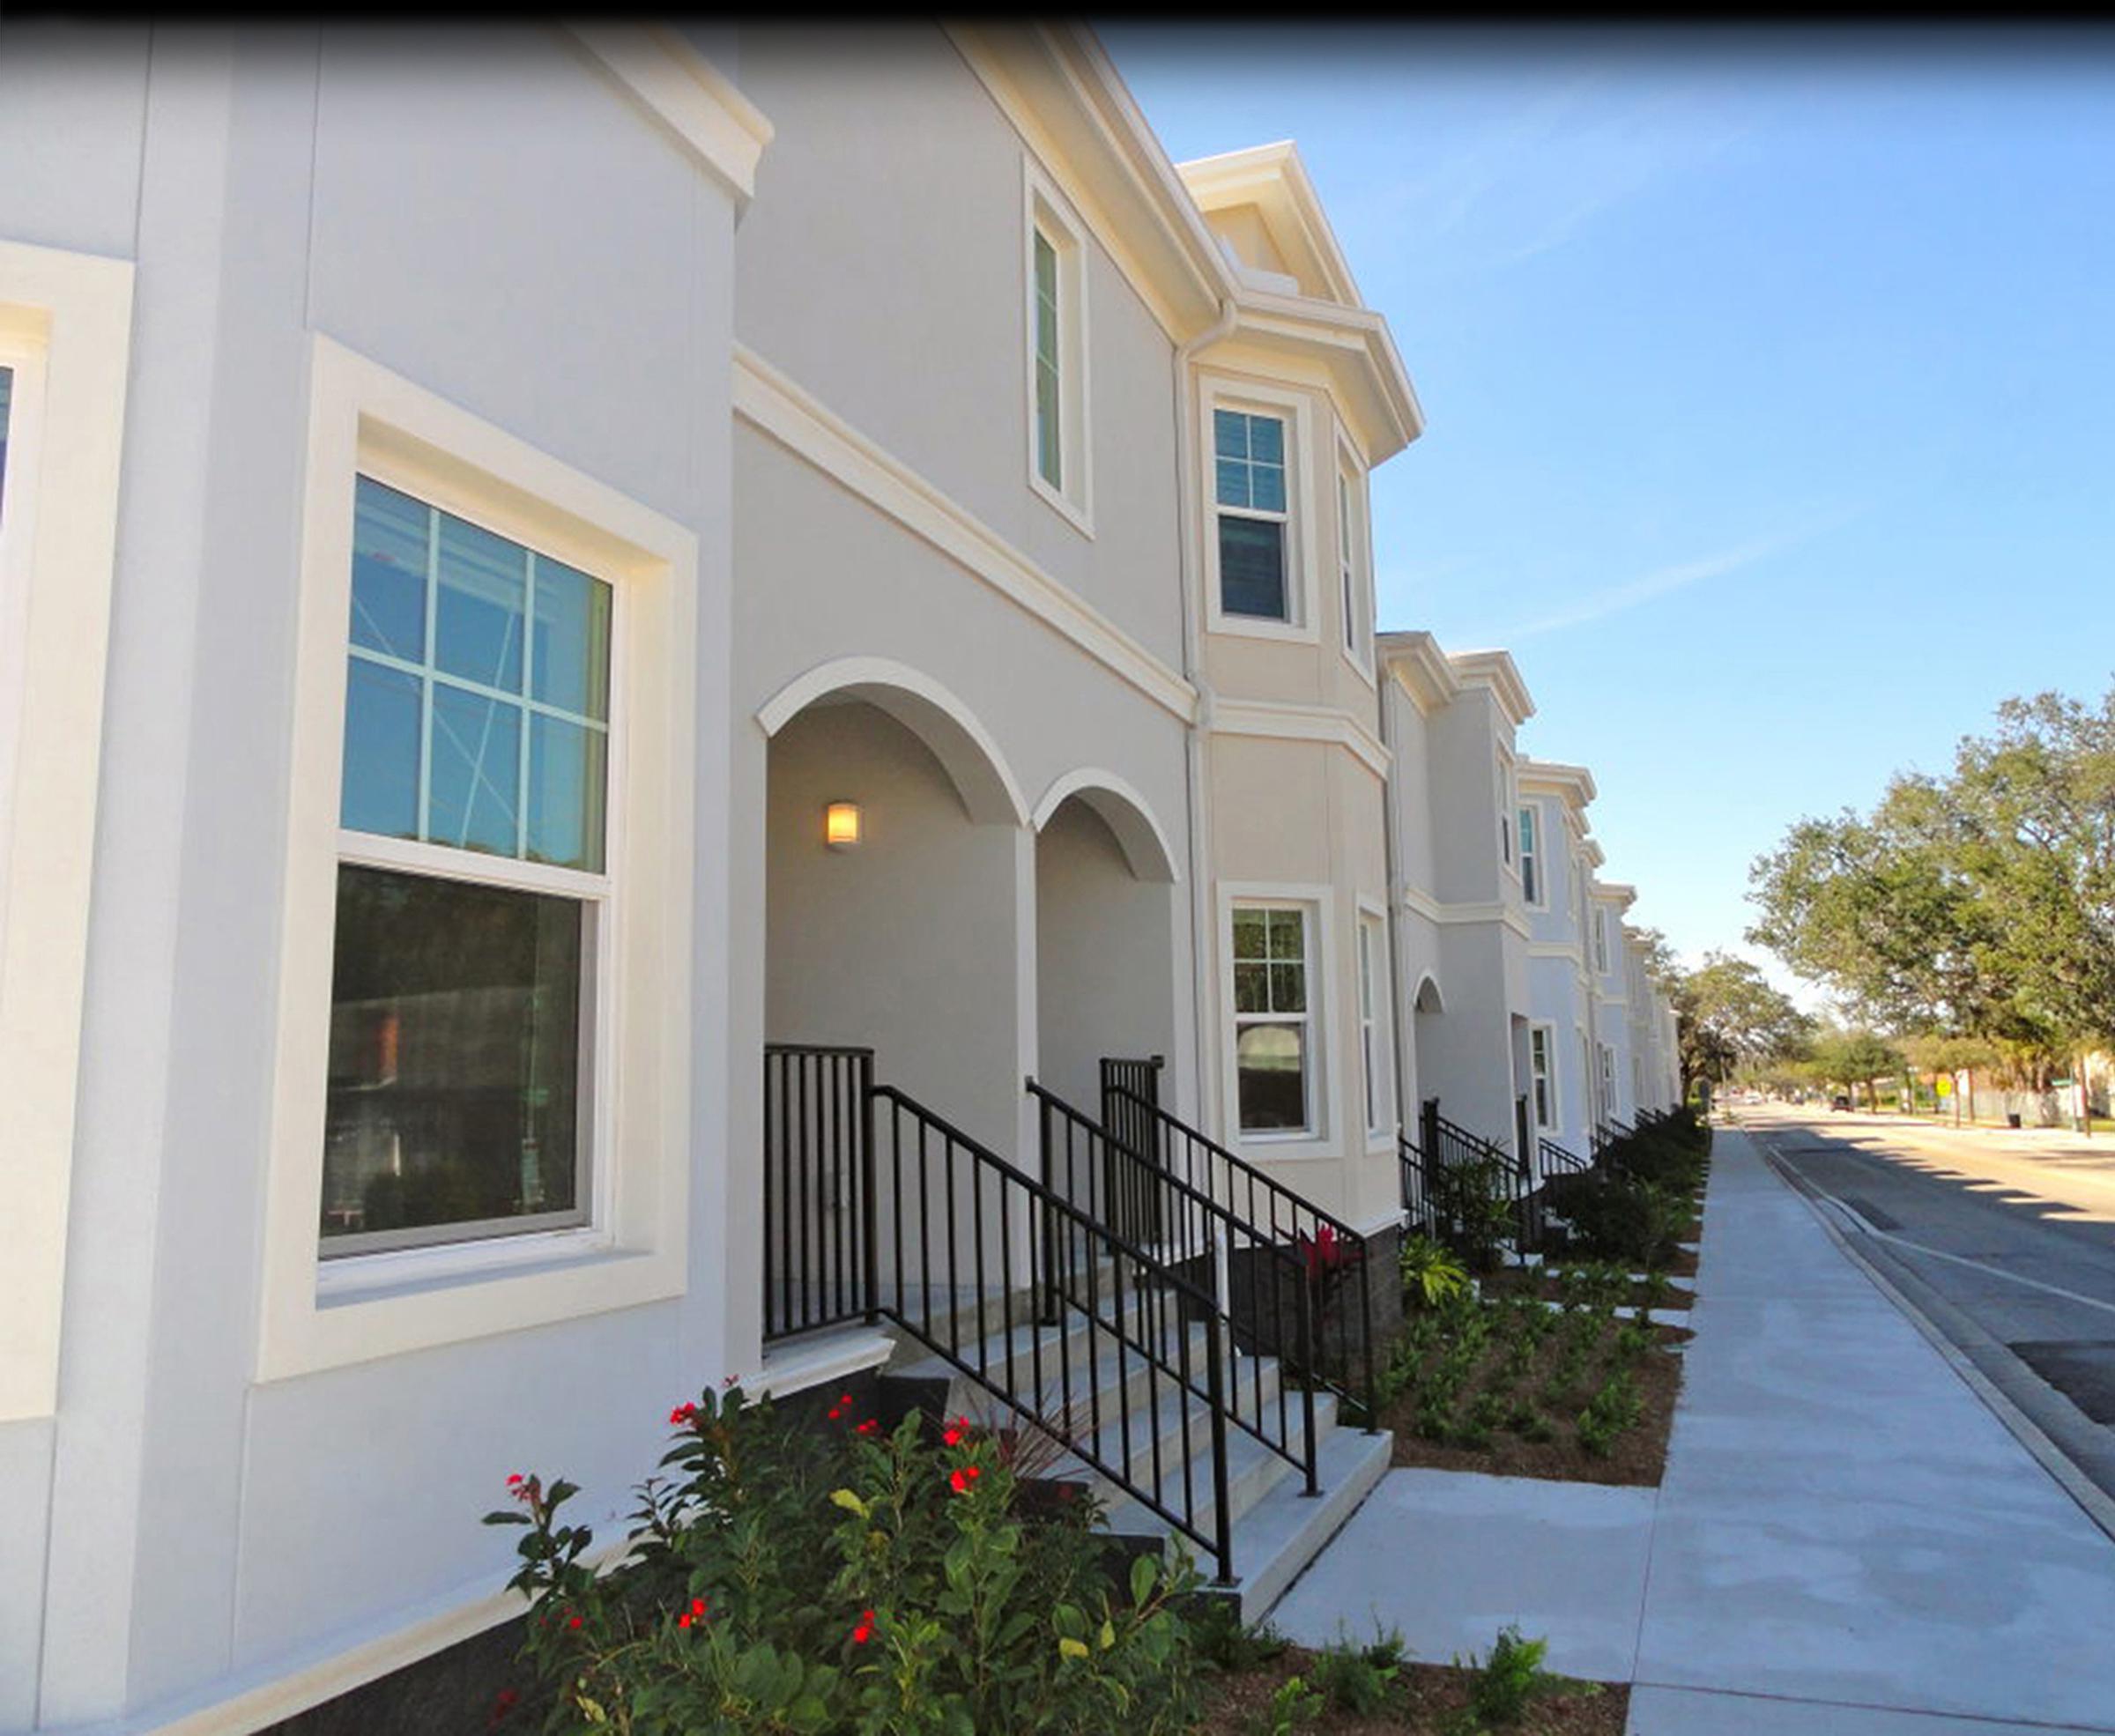 Sarasota Housing Authority King Stone Townhomes